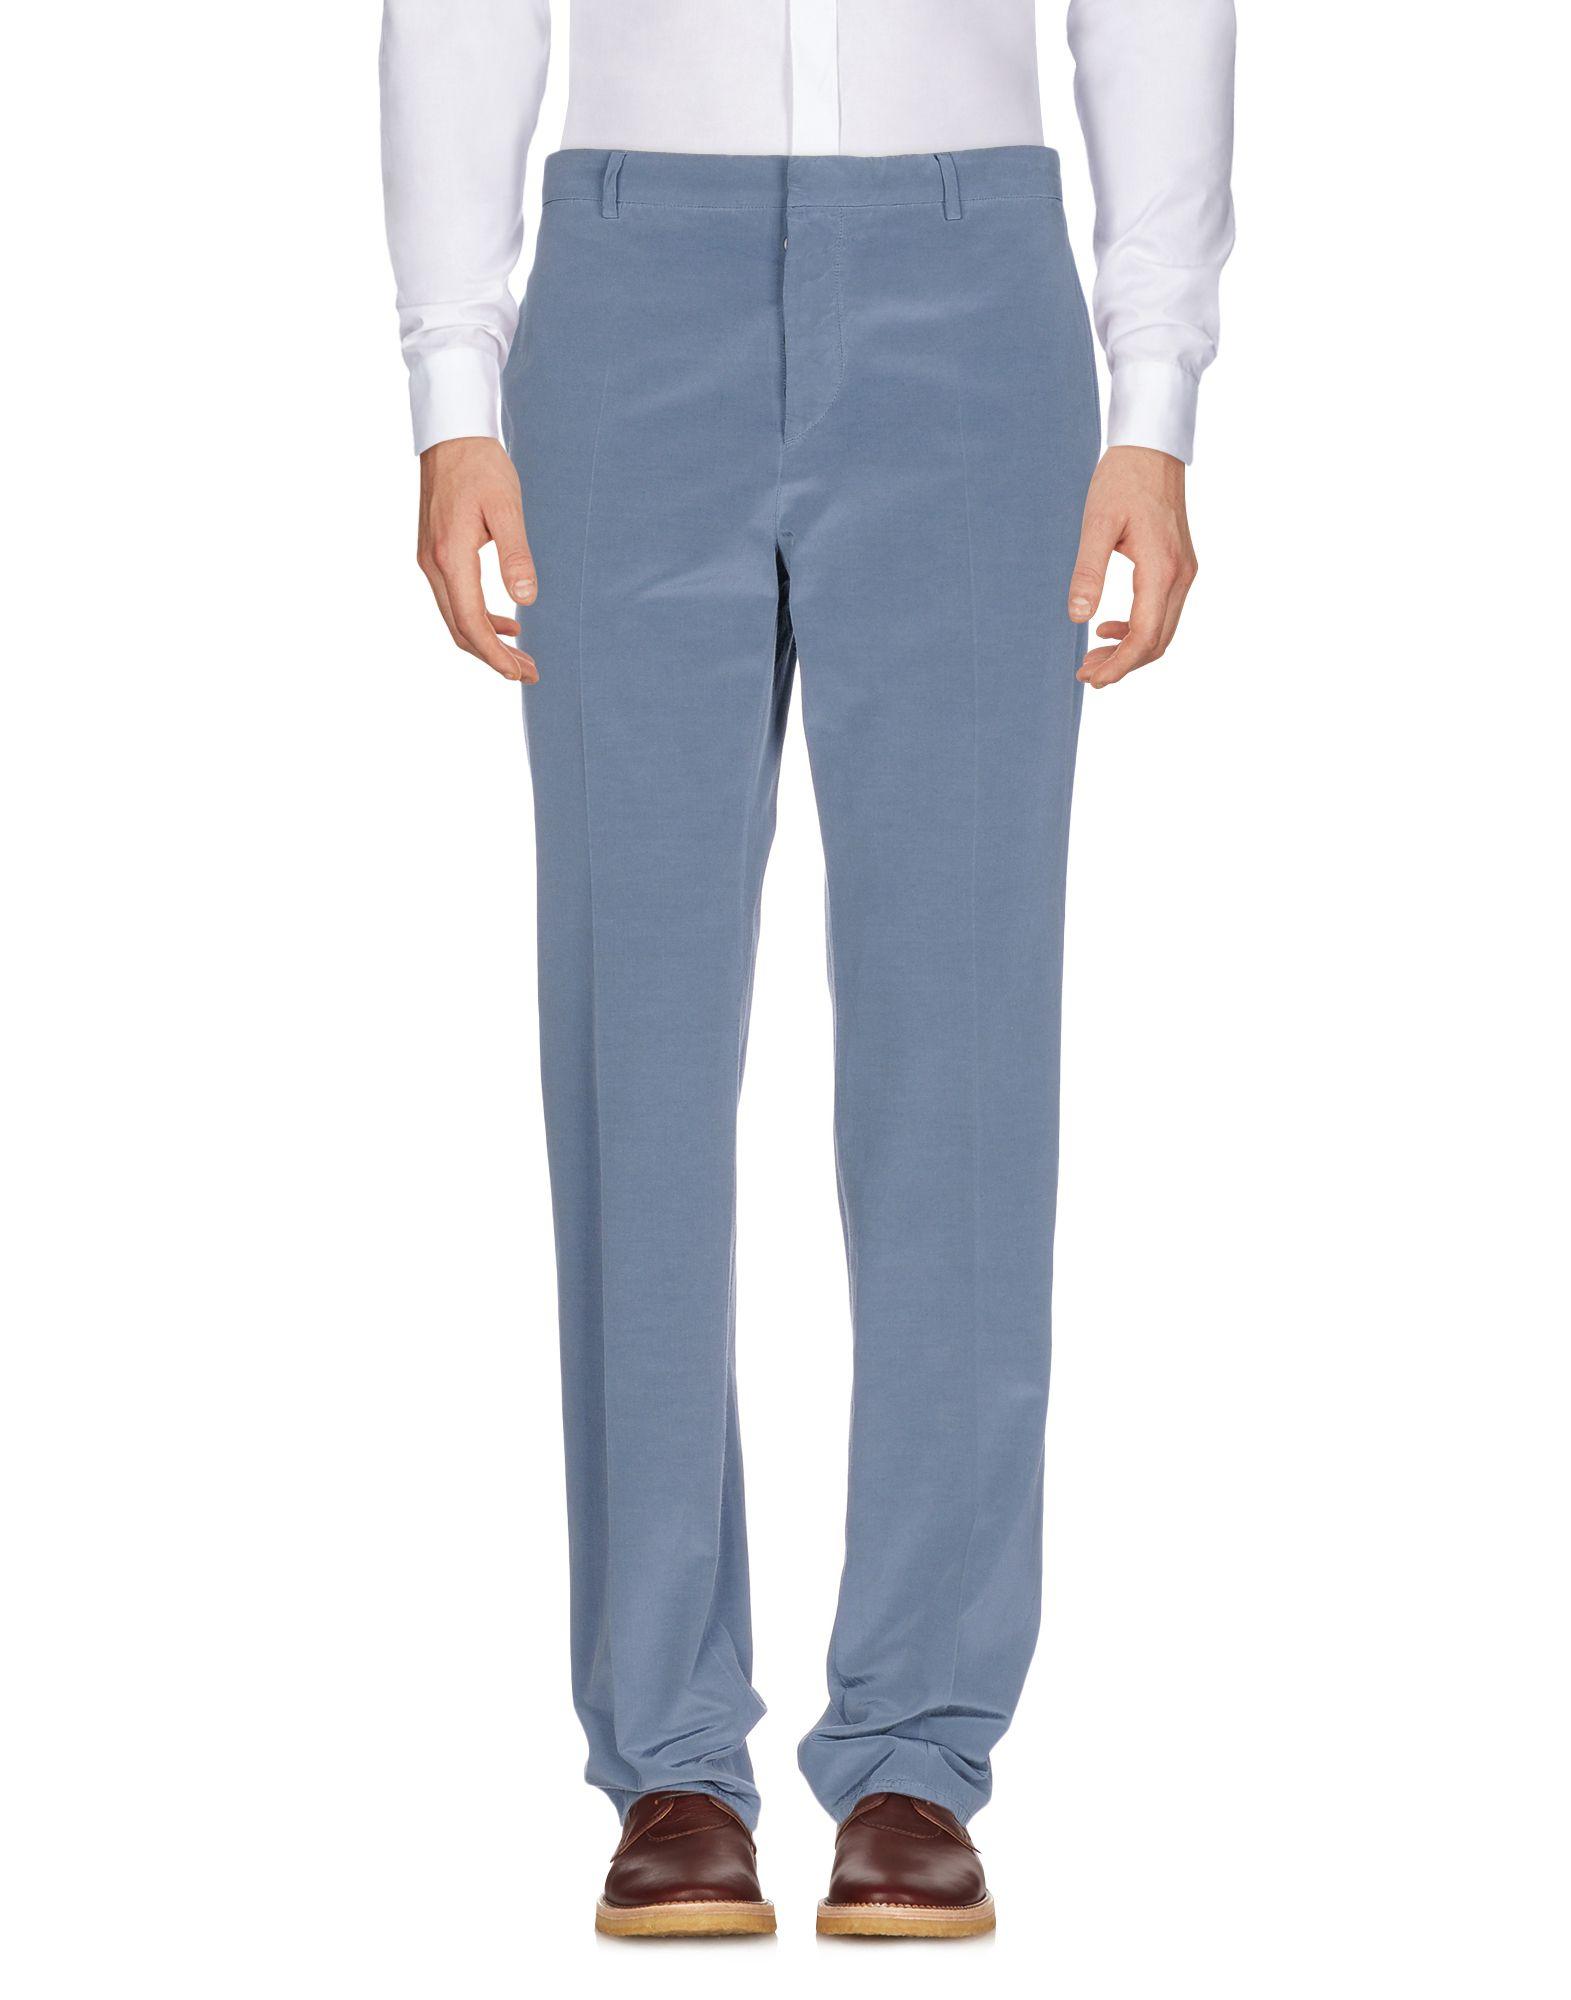 Pantalone Jil Sander Donna - Acquista online su